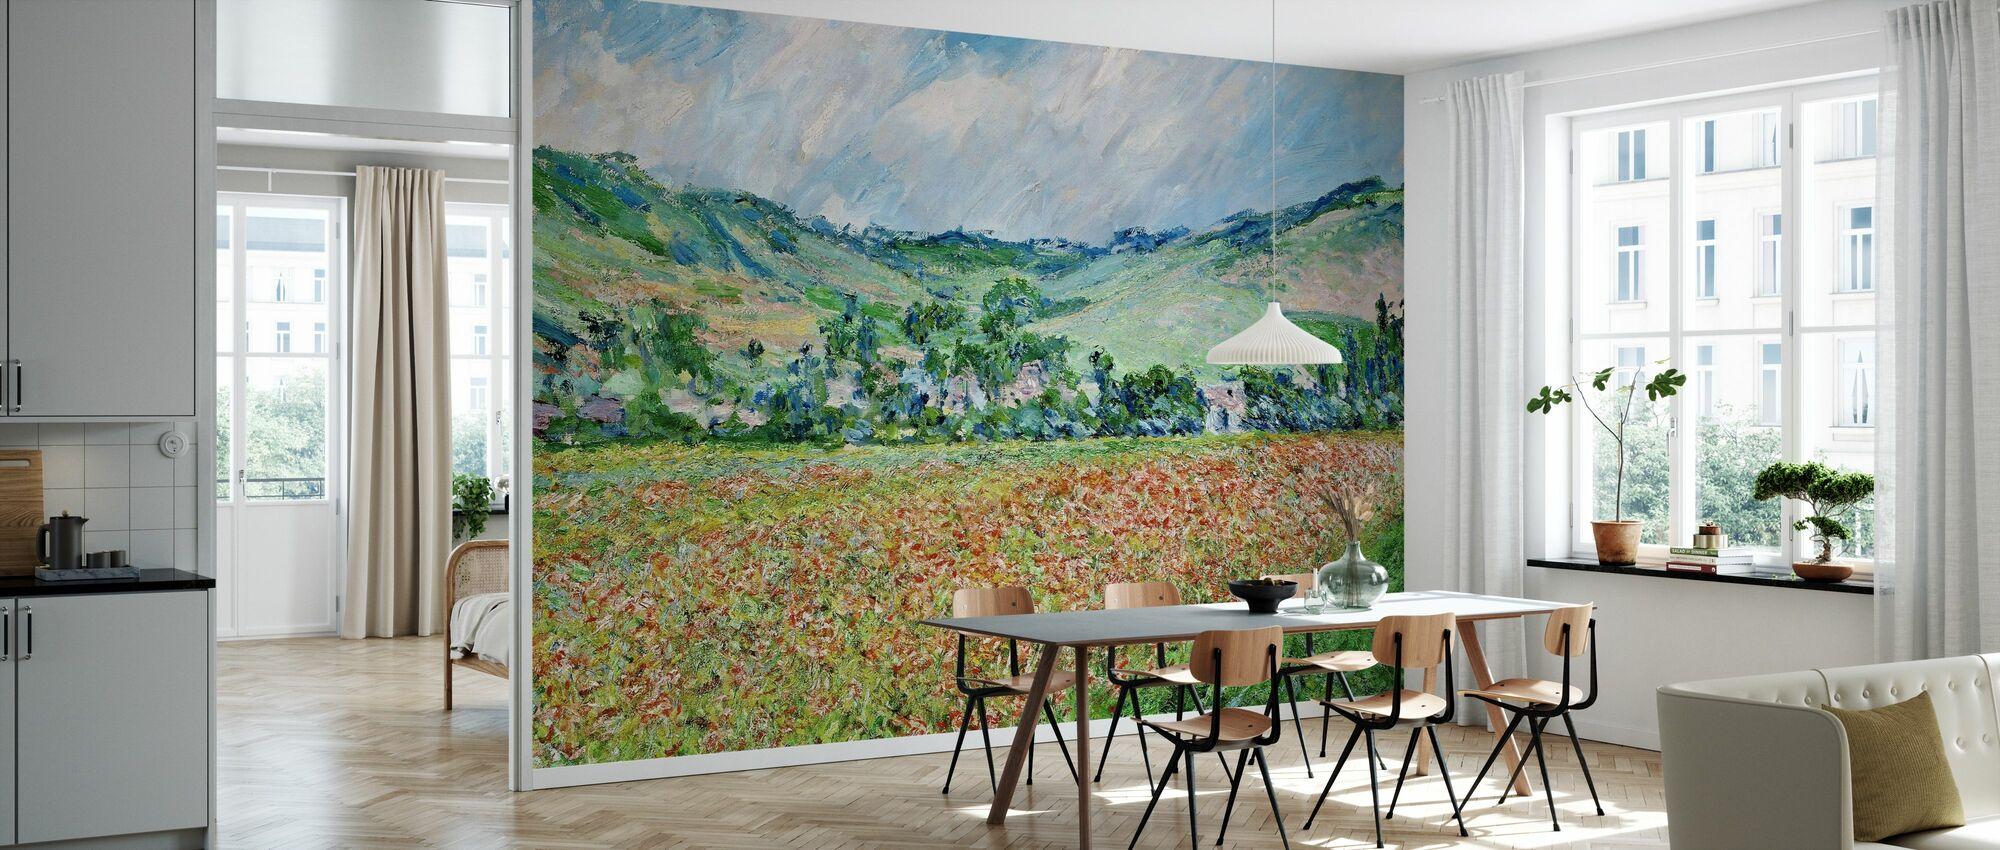 Poppies - Vincent Van Gogh - Wallpaper - Kitchen